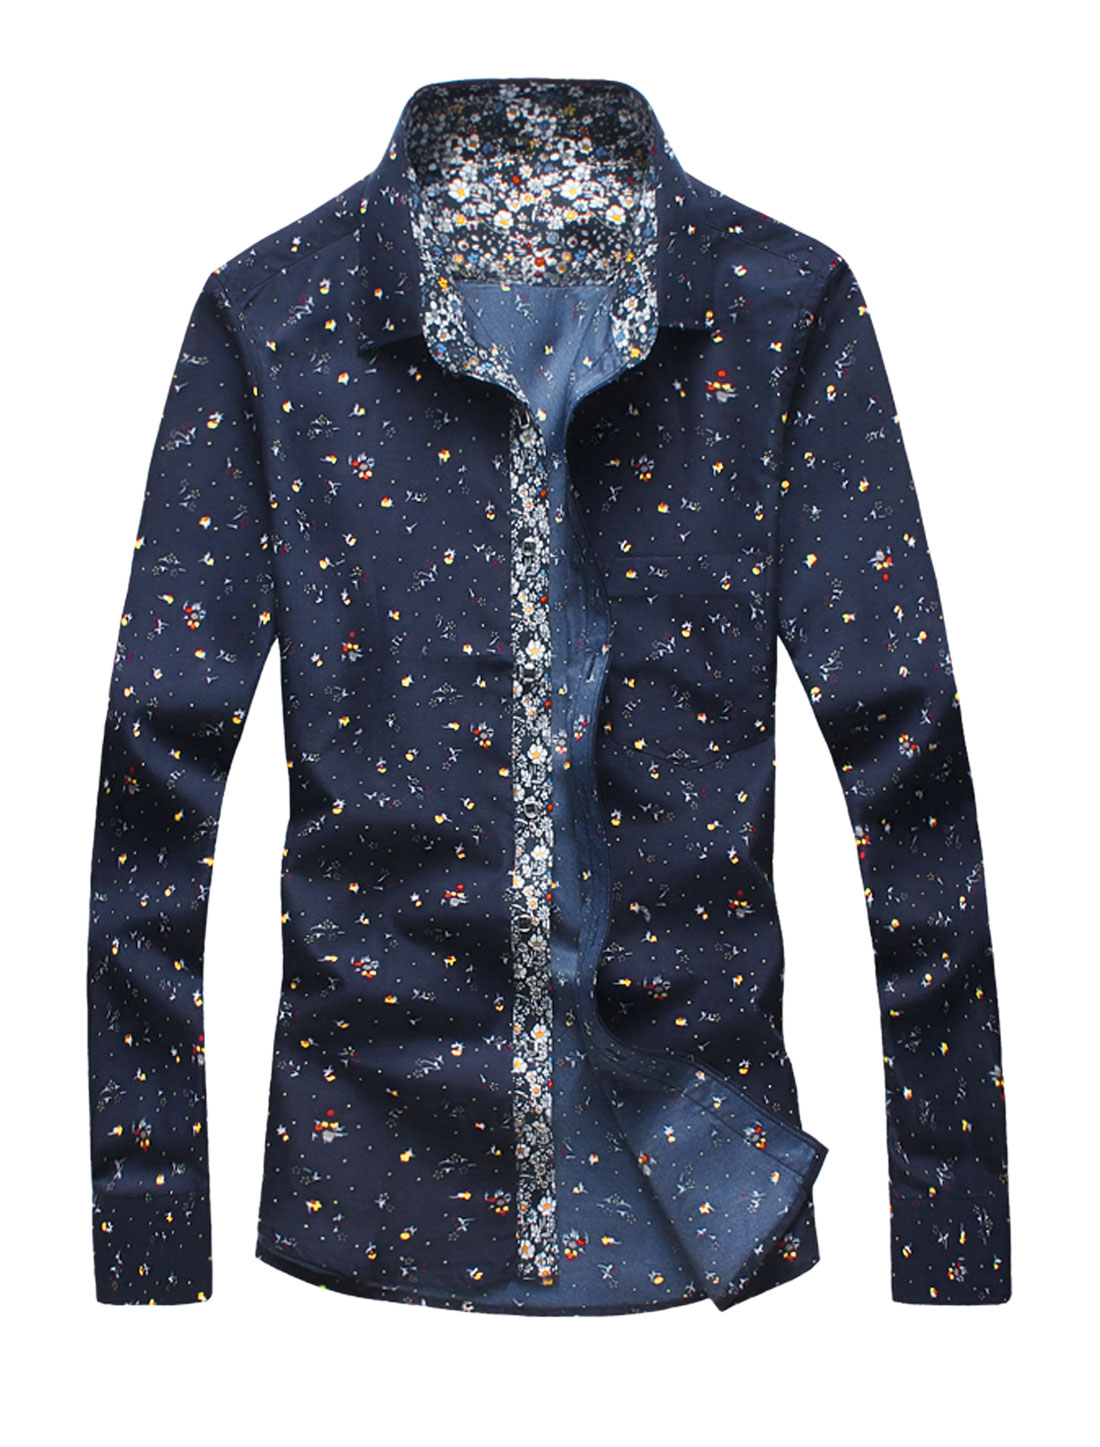 Men One Pocket Slim Fit Single Breasted Flower Print Shirt Navy Blue M